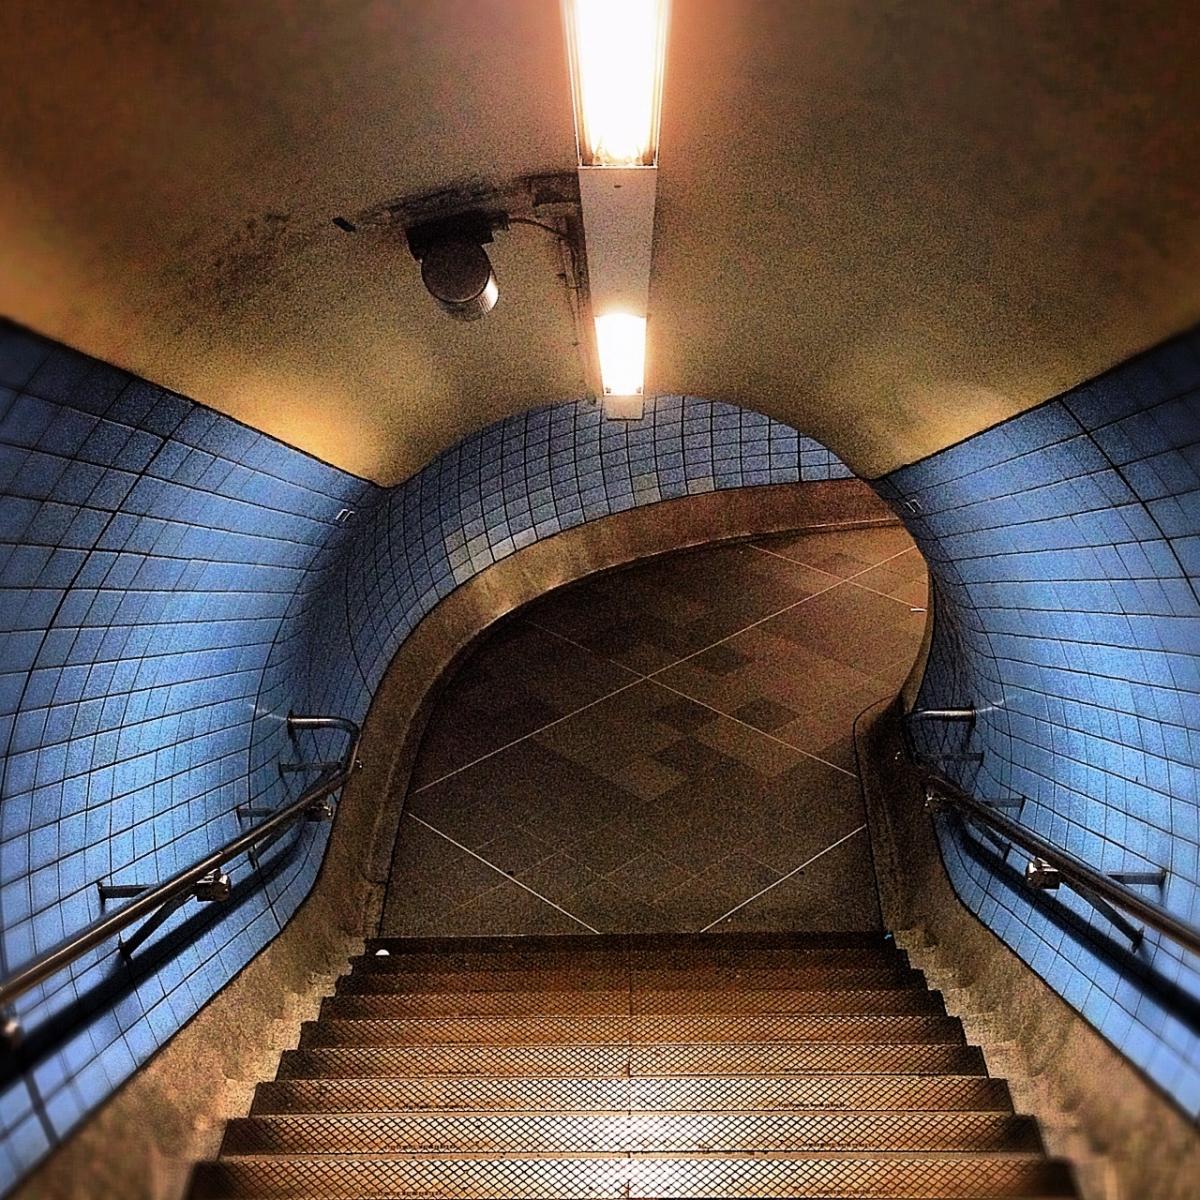 Subway Embankment